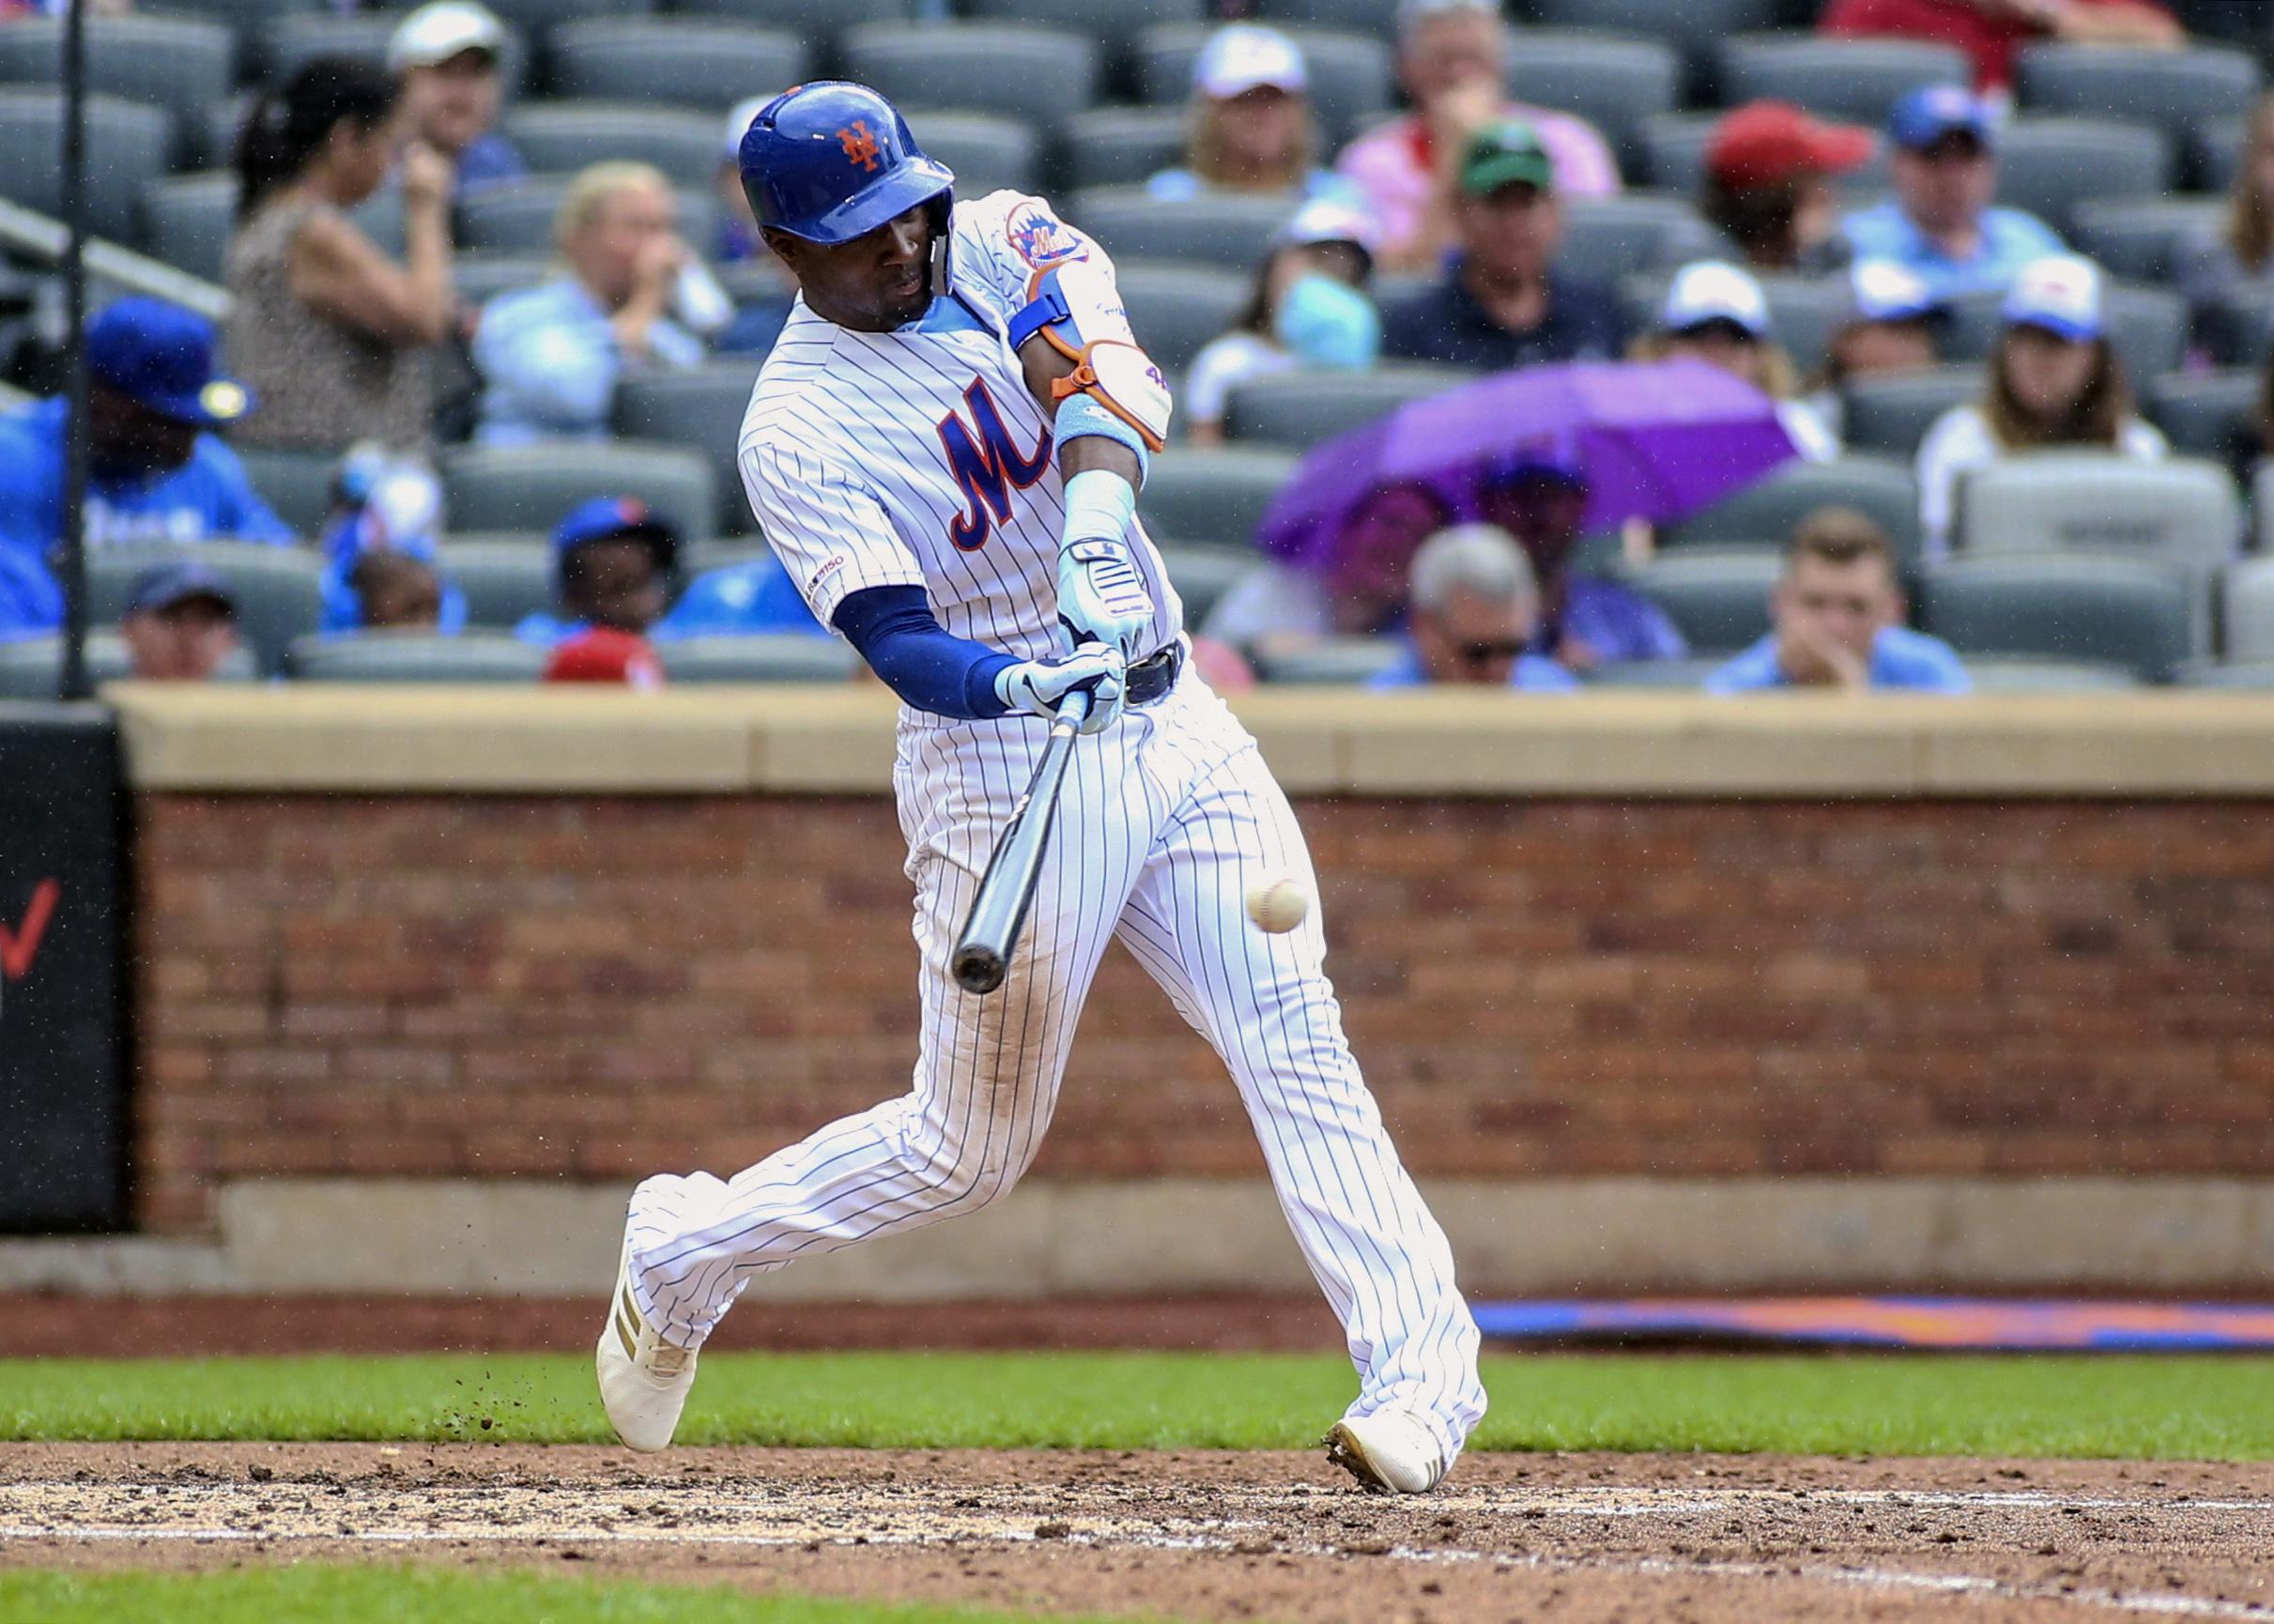 6/17/19 Game Preview: New York Mets at Atlanta Braves